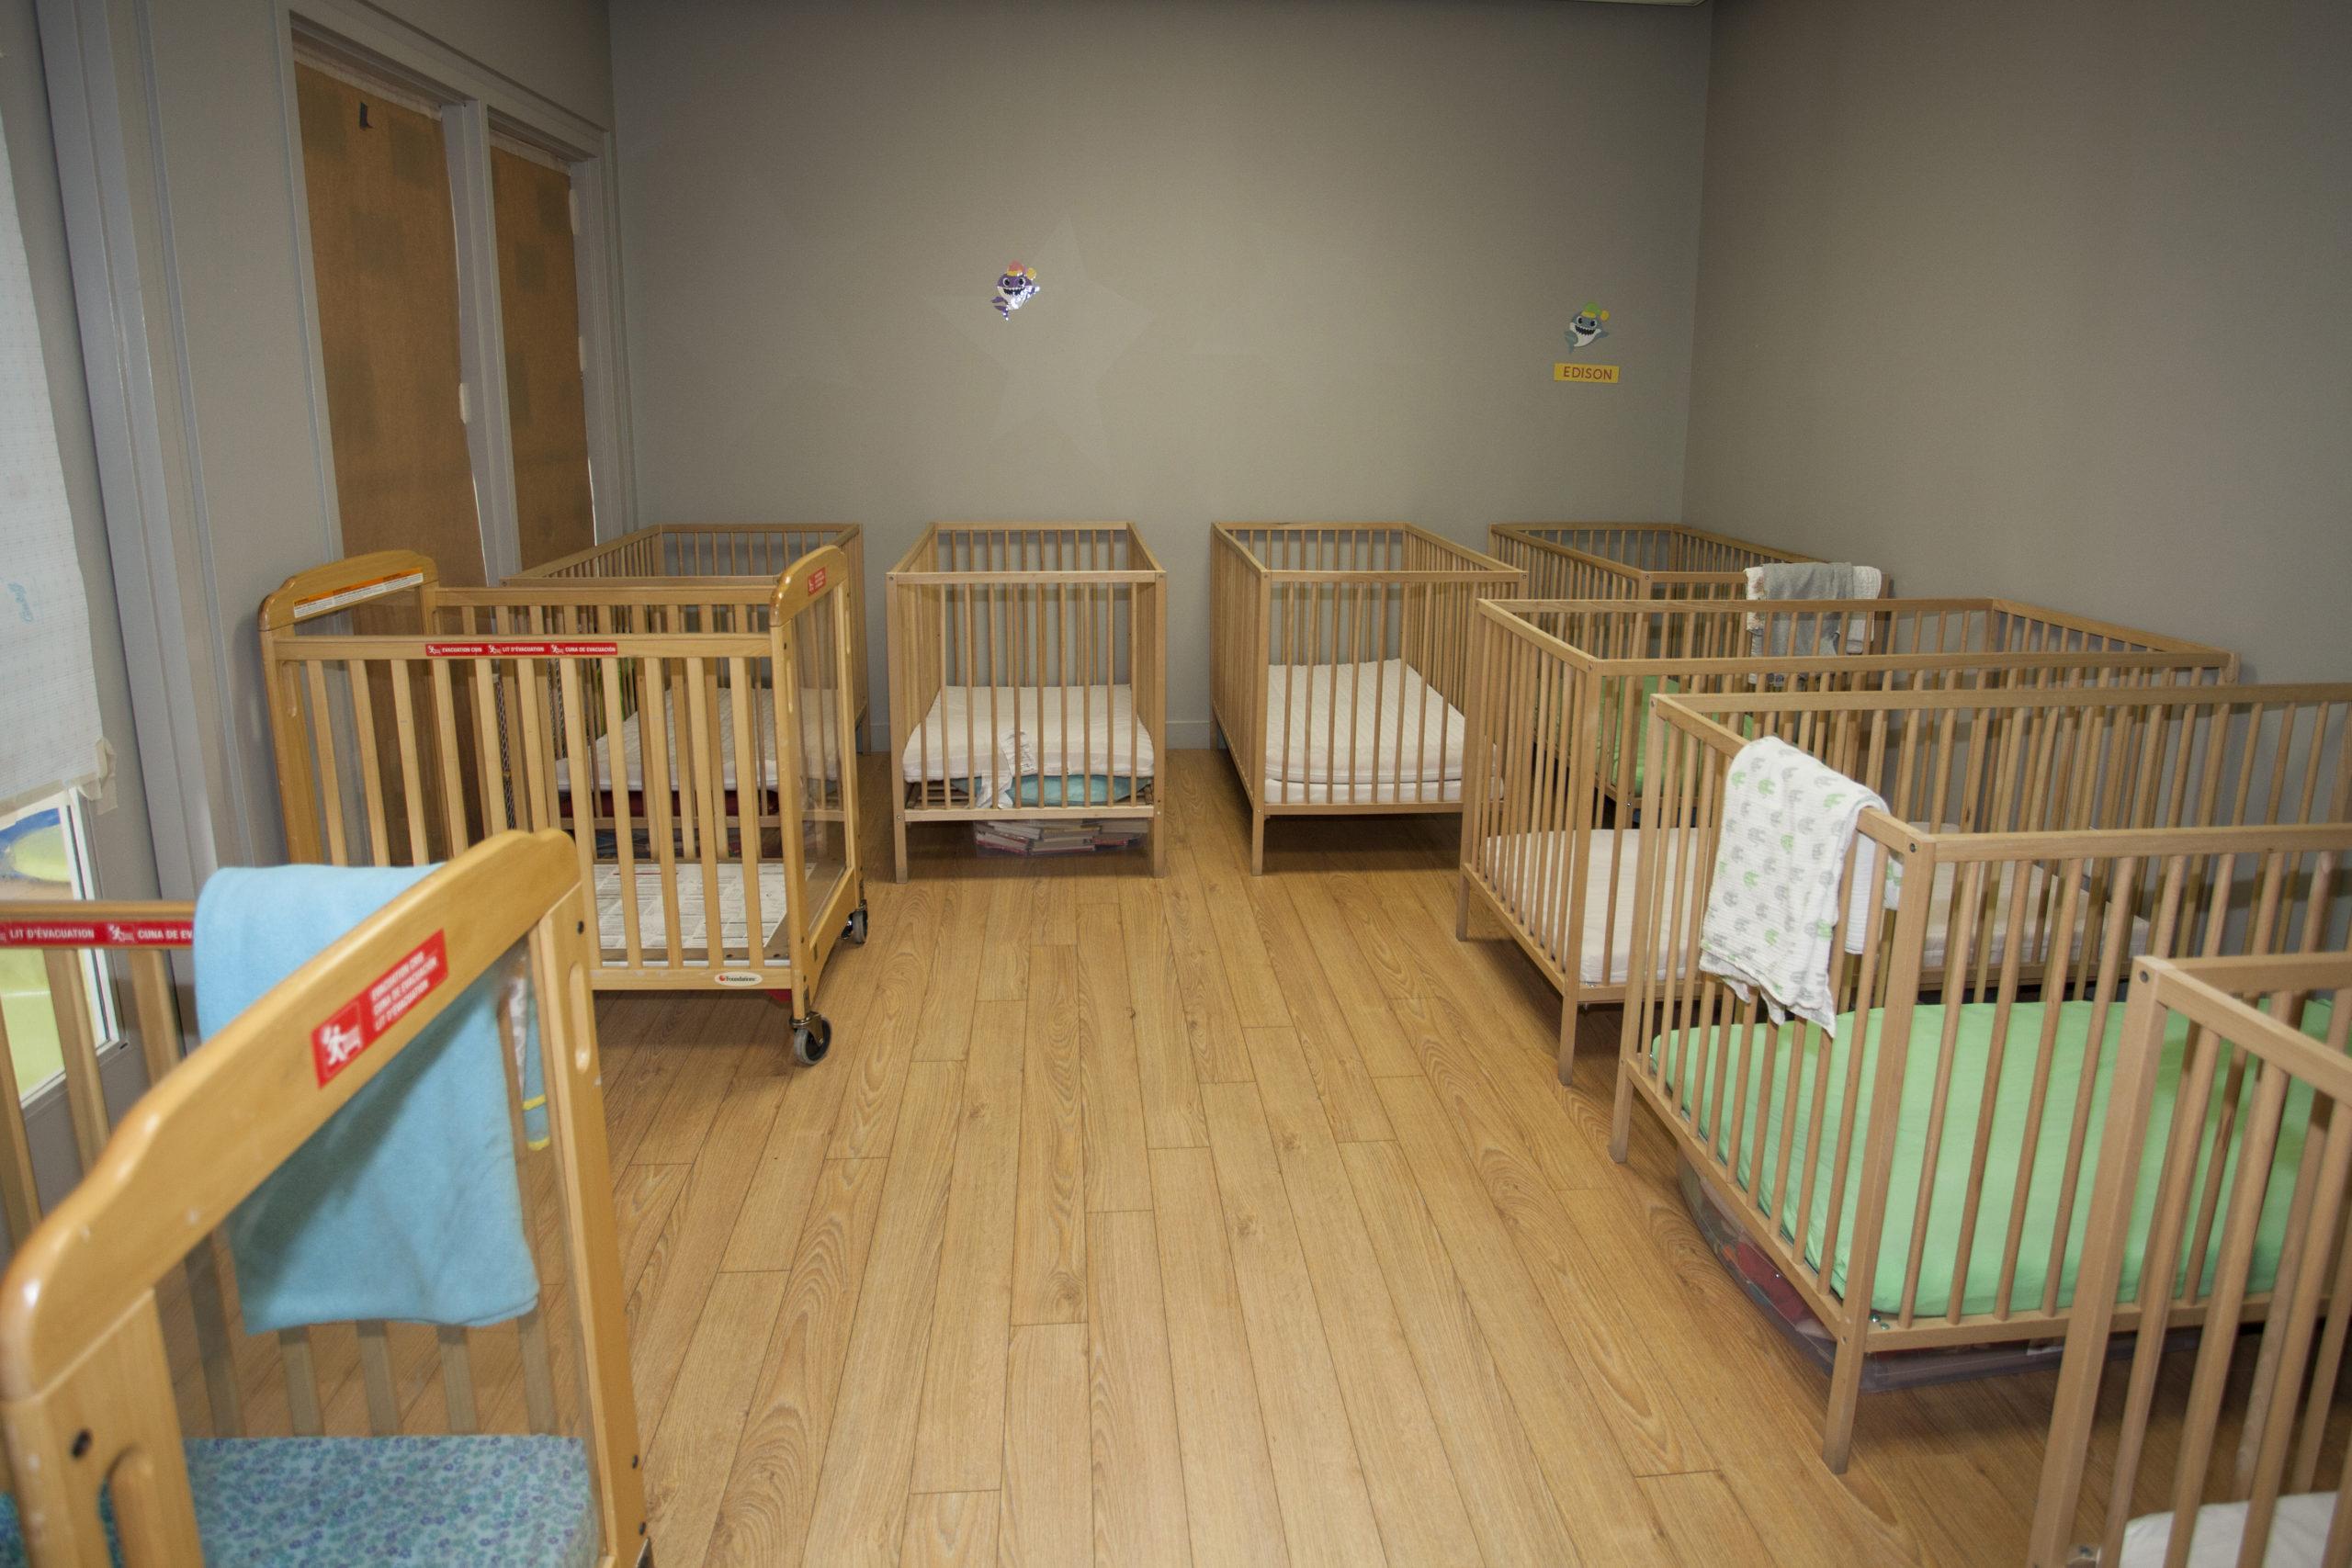 infant sleep room with cribs